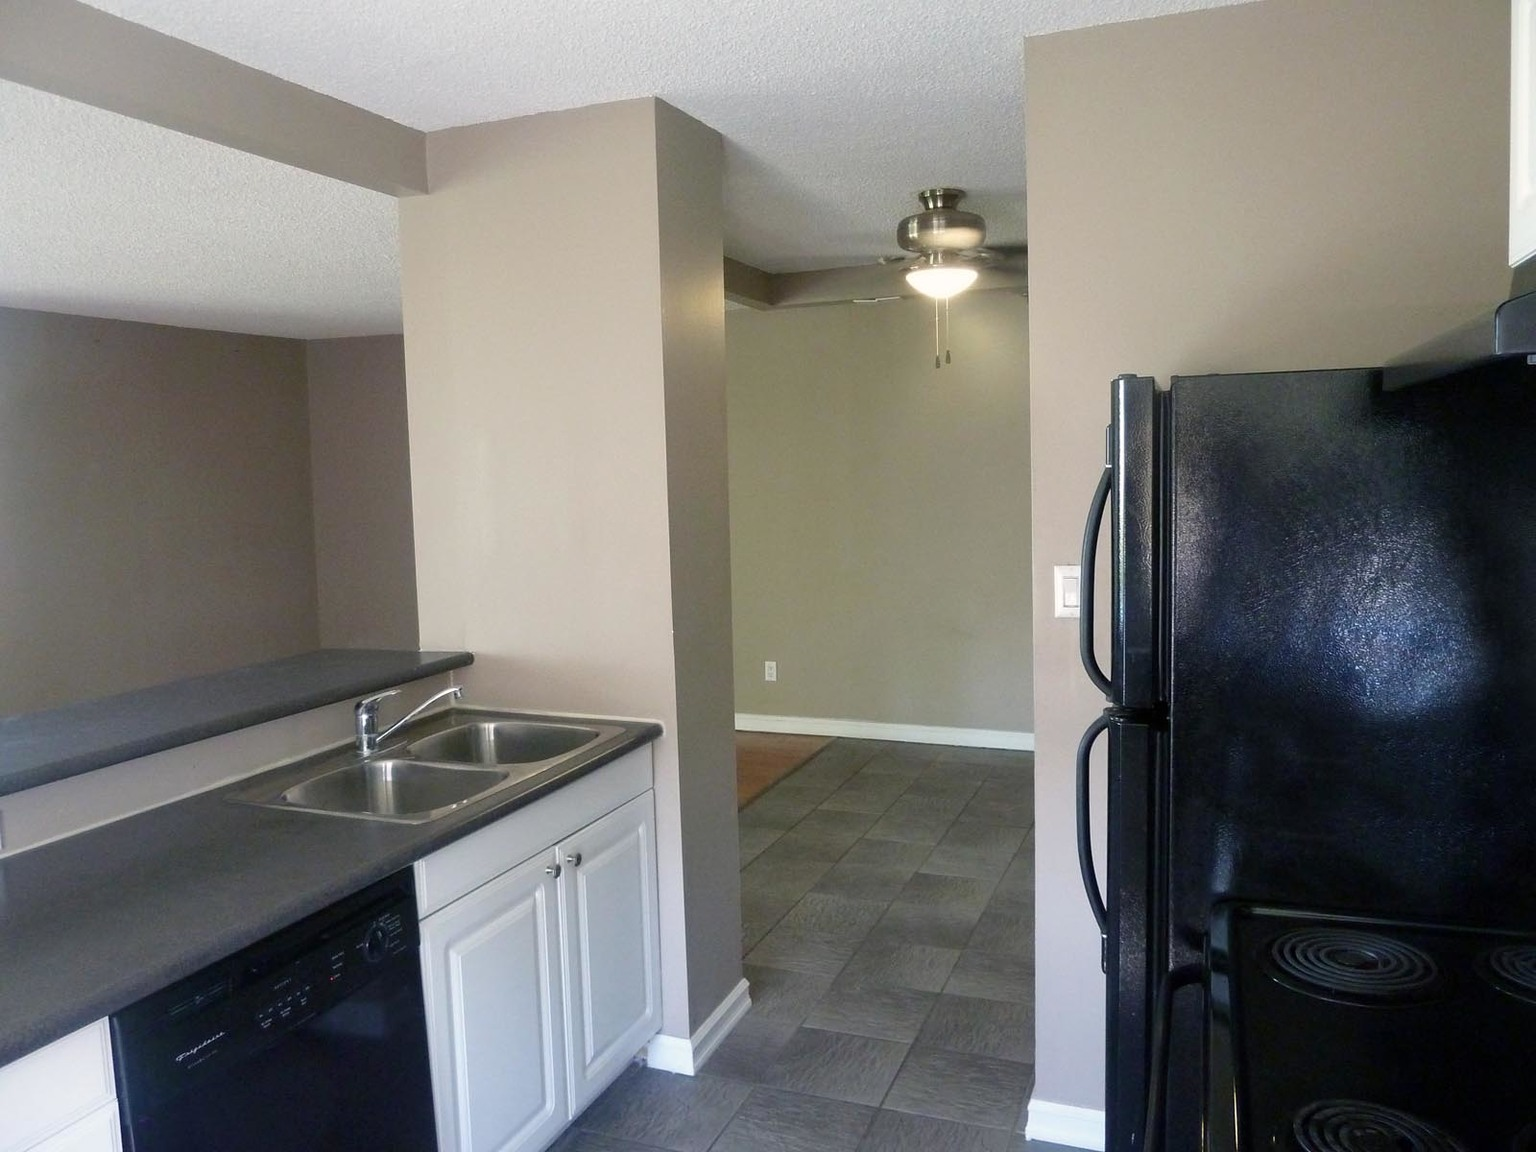 1611 23 Avenue SW, Calgary, AB - $1,700